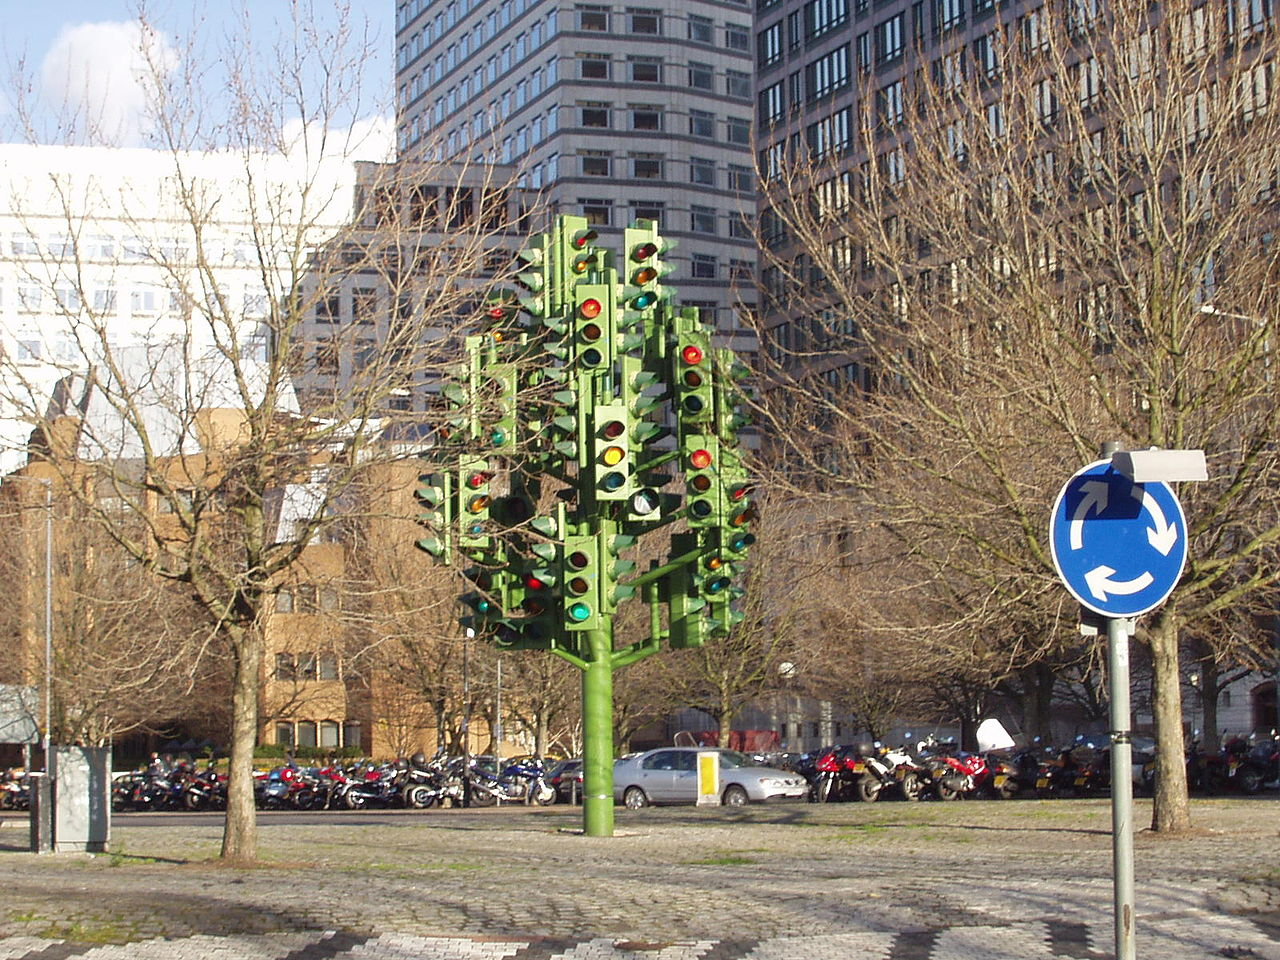 1280px-Traffic_Light_Tree_Canary_Wharf.j